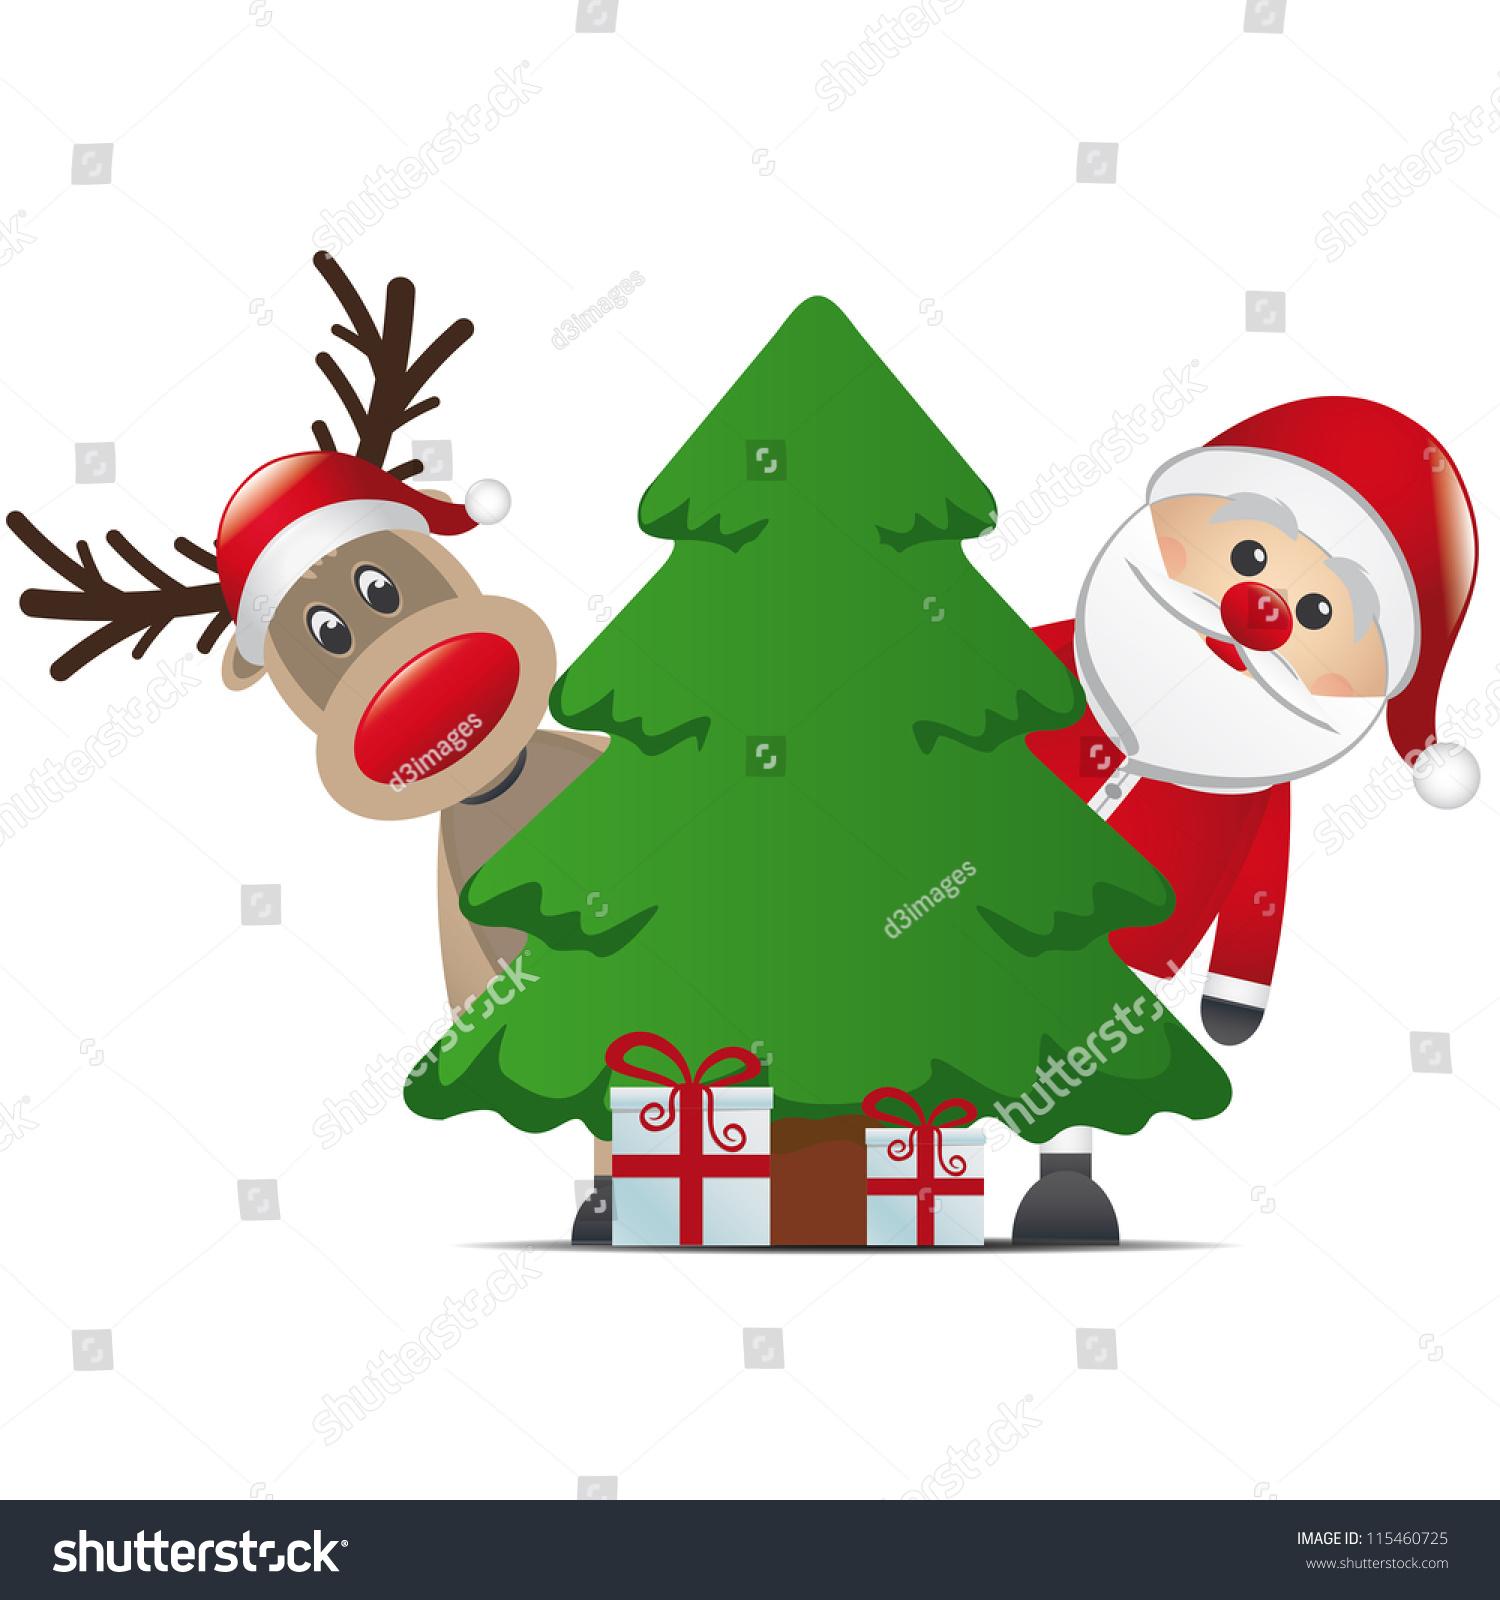 Reindeer Santa Claus Christmas Tree Gift Stock Vector ...